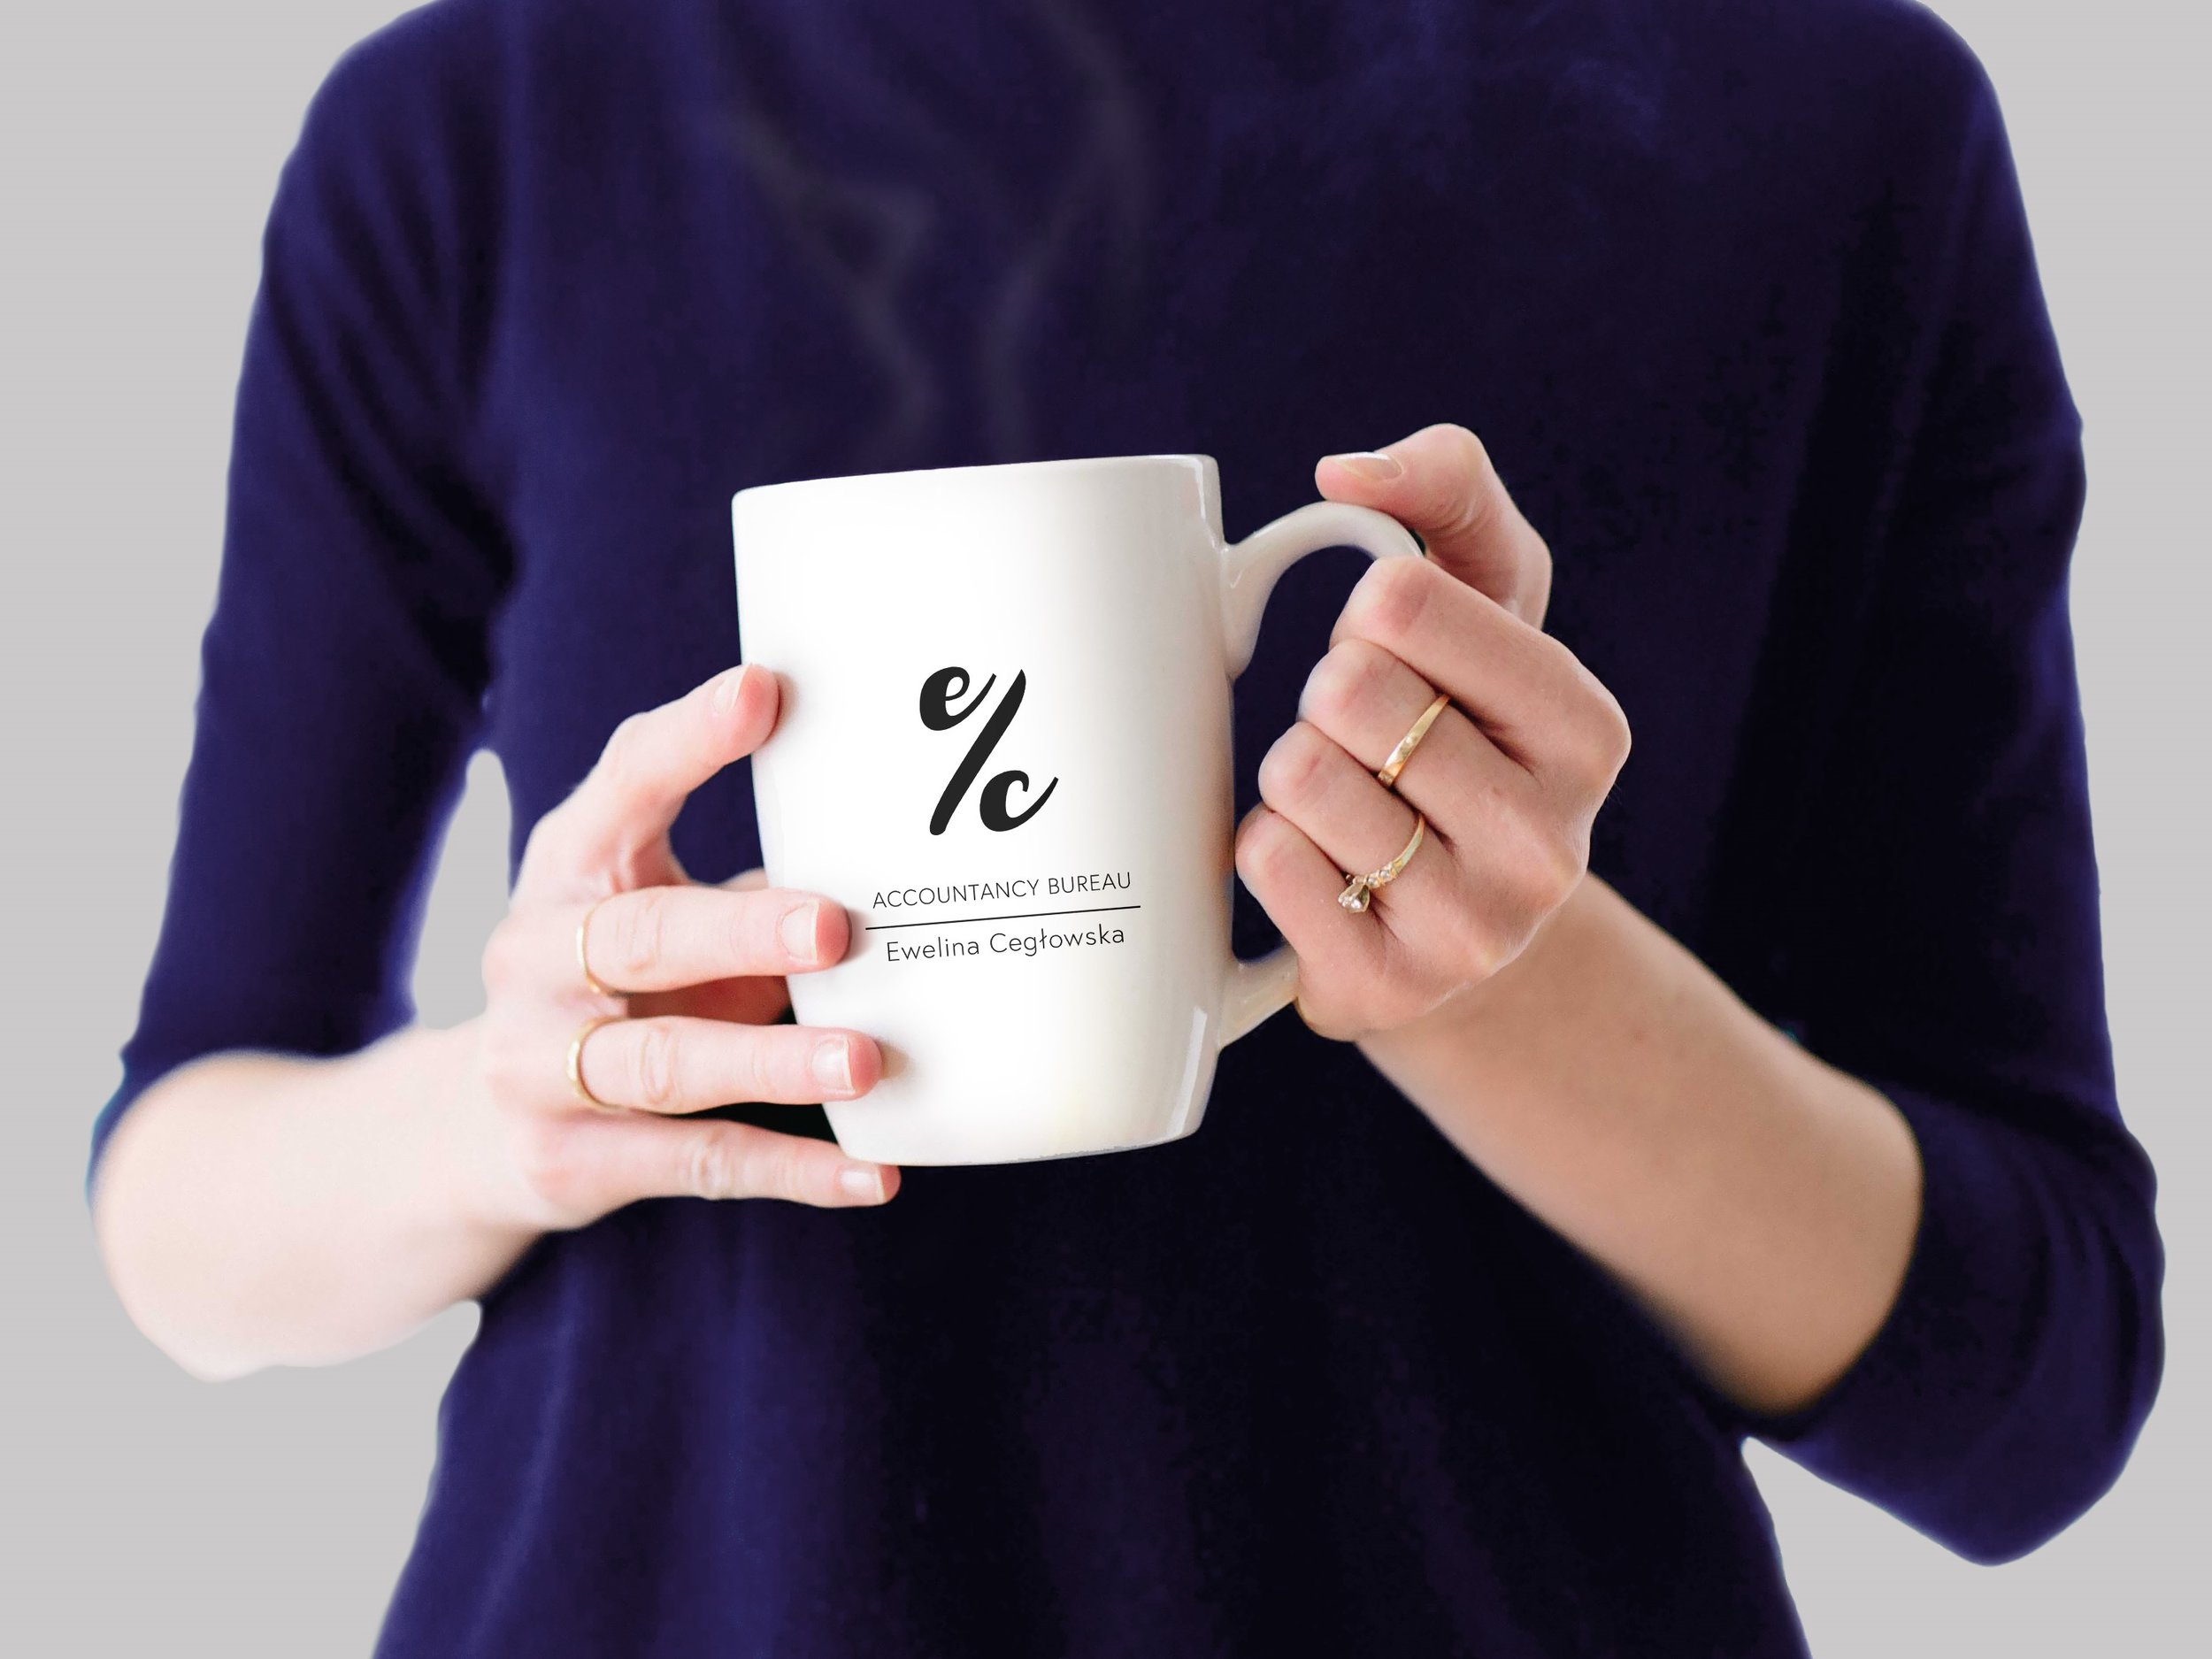 Coffee-Cup ebc2.jpg